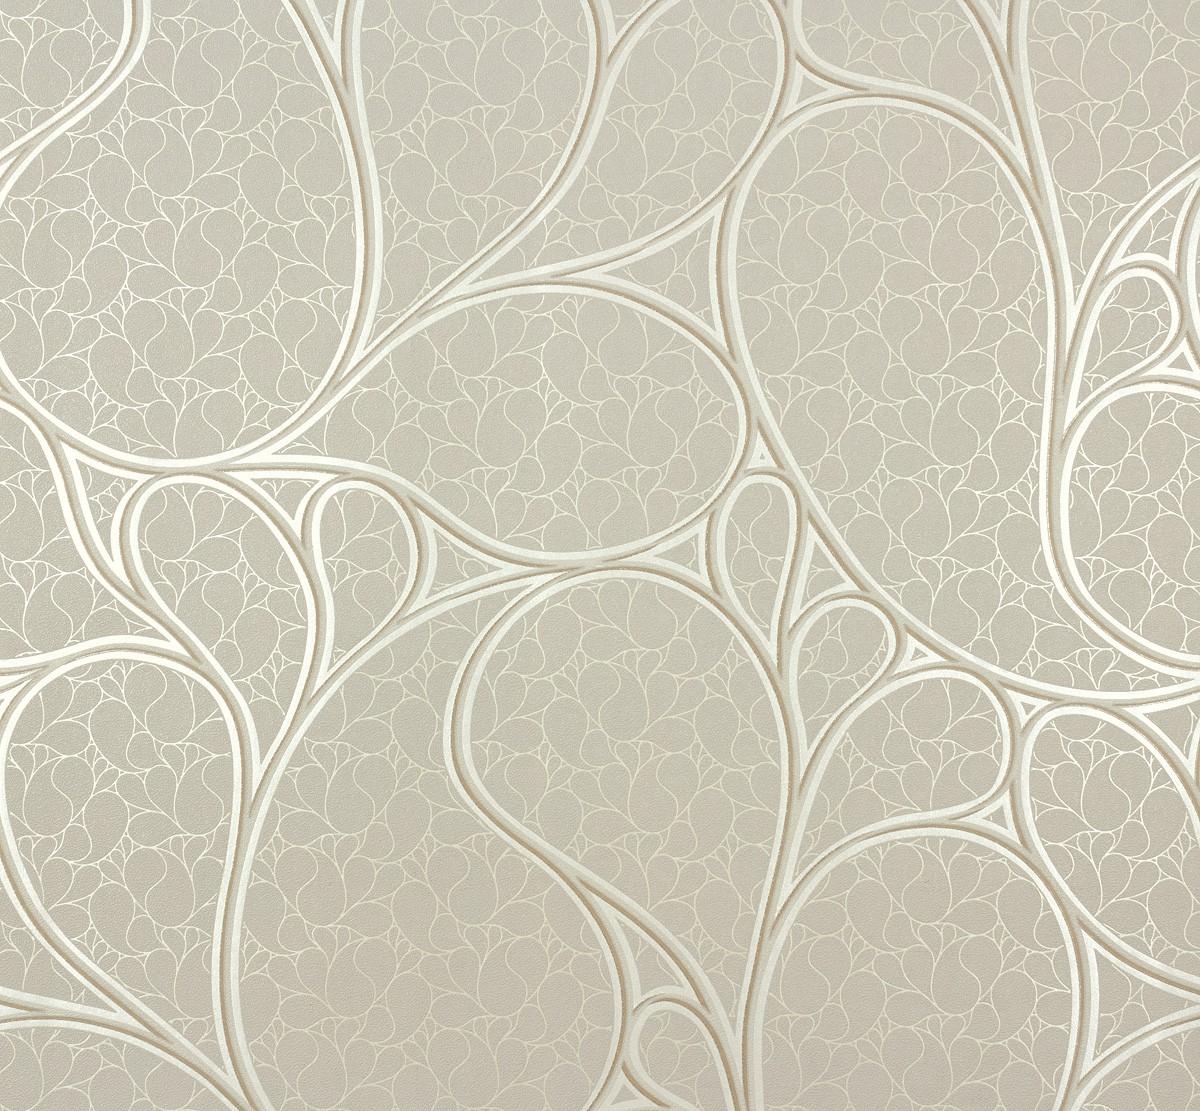 Beige and gray wallpaper wallpapersafari for Modern wallpaper designs